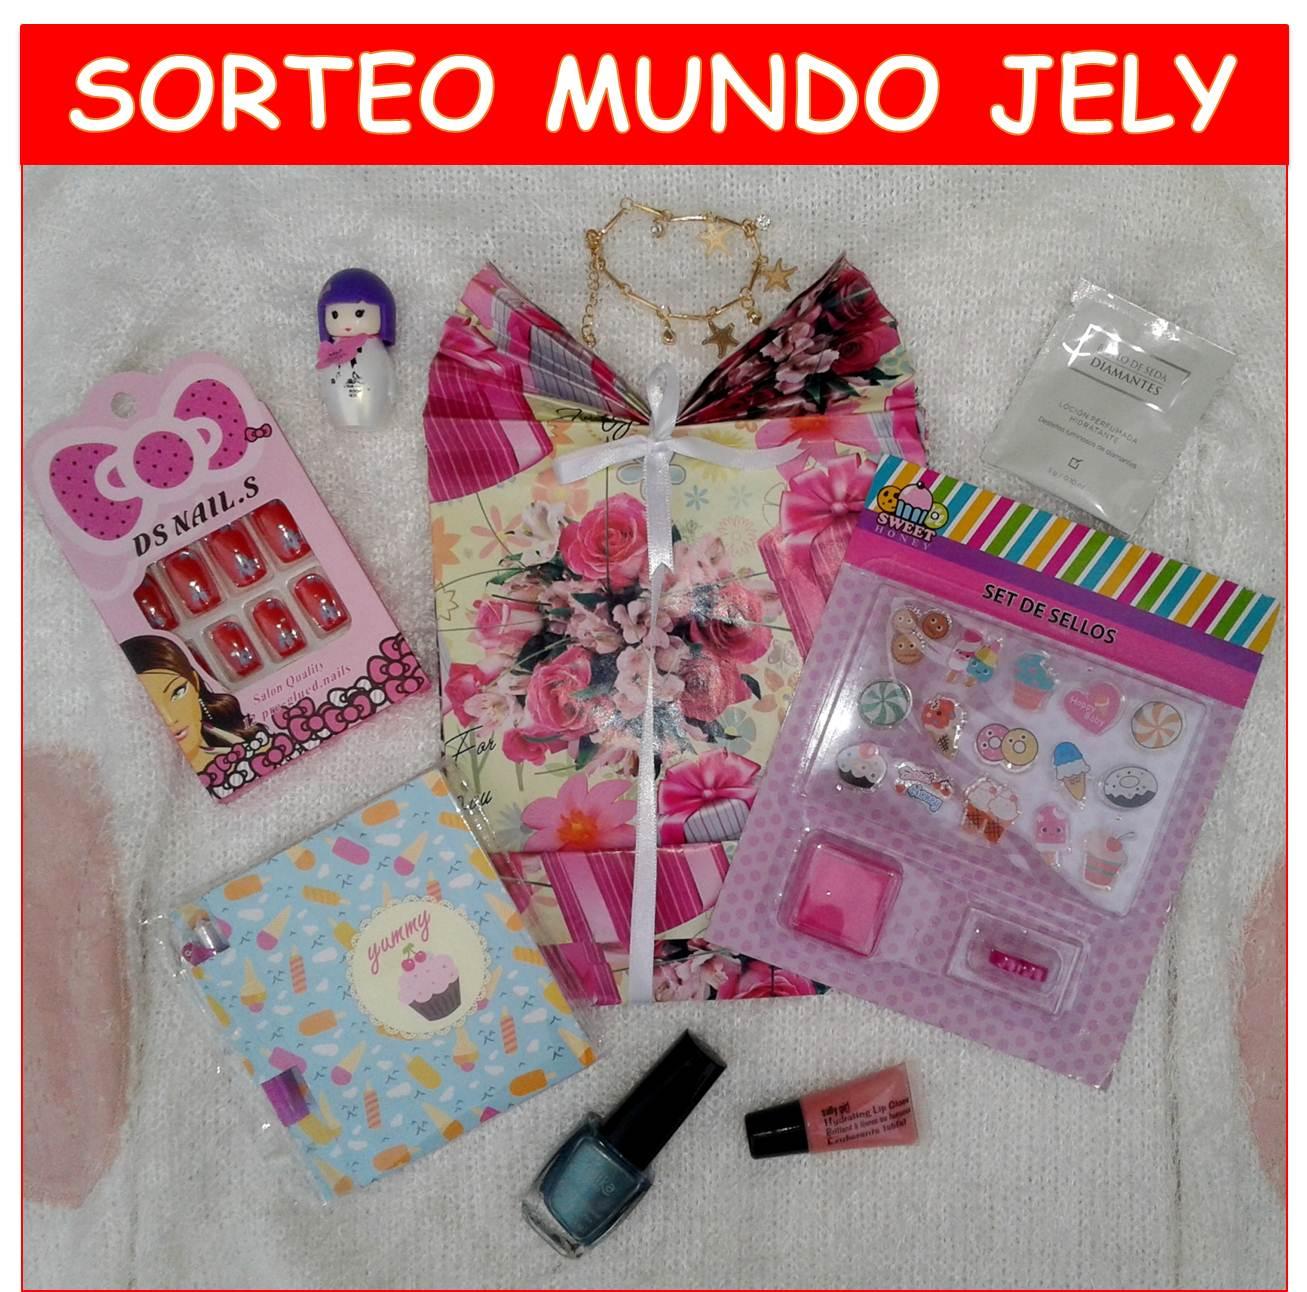 SORTEO MUNDO JELY